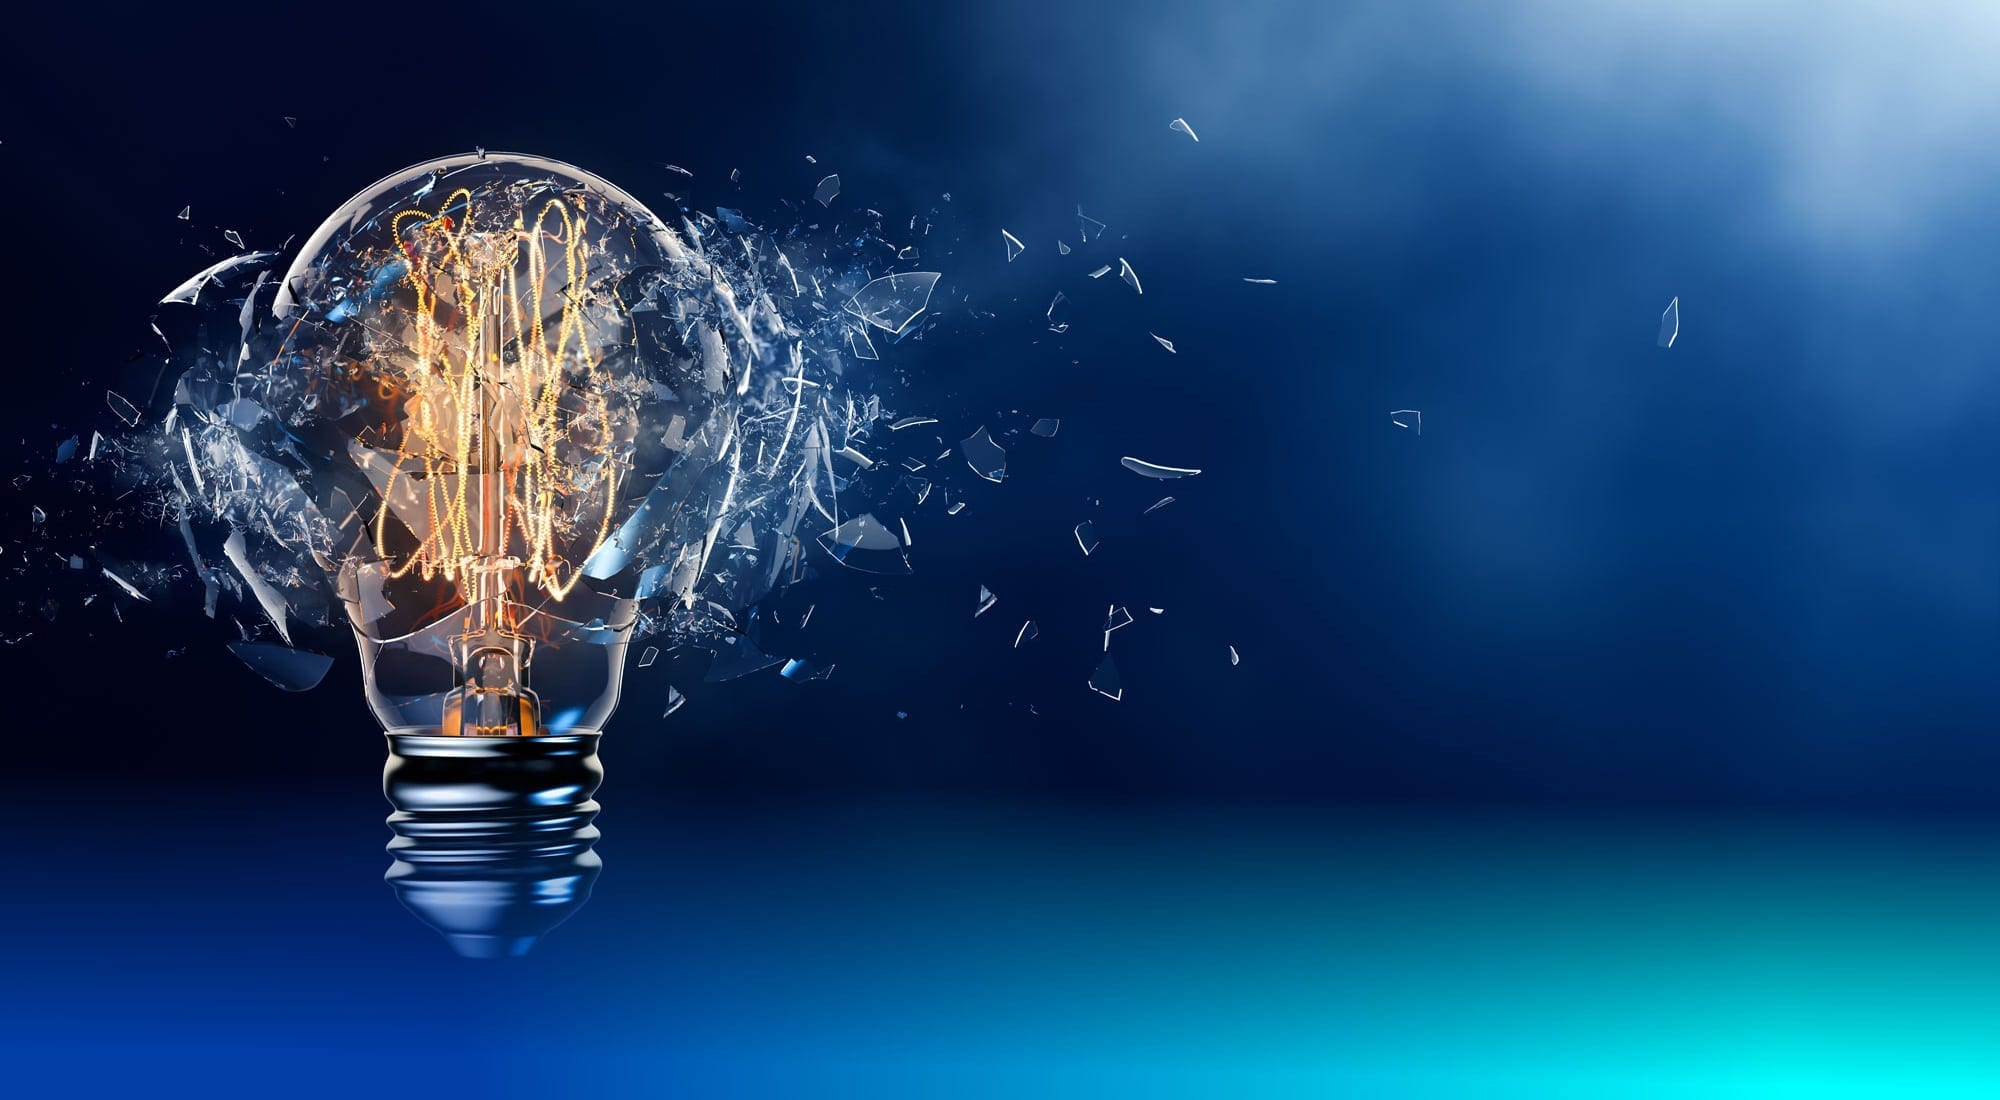 New technologies lead Edison-era electricity grid into the future